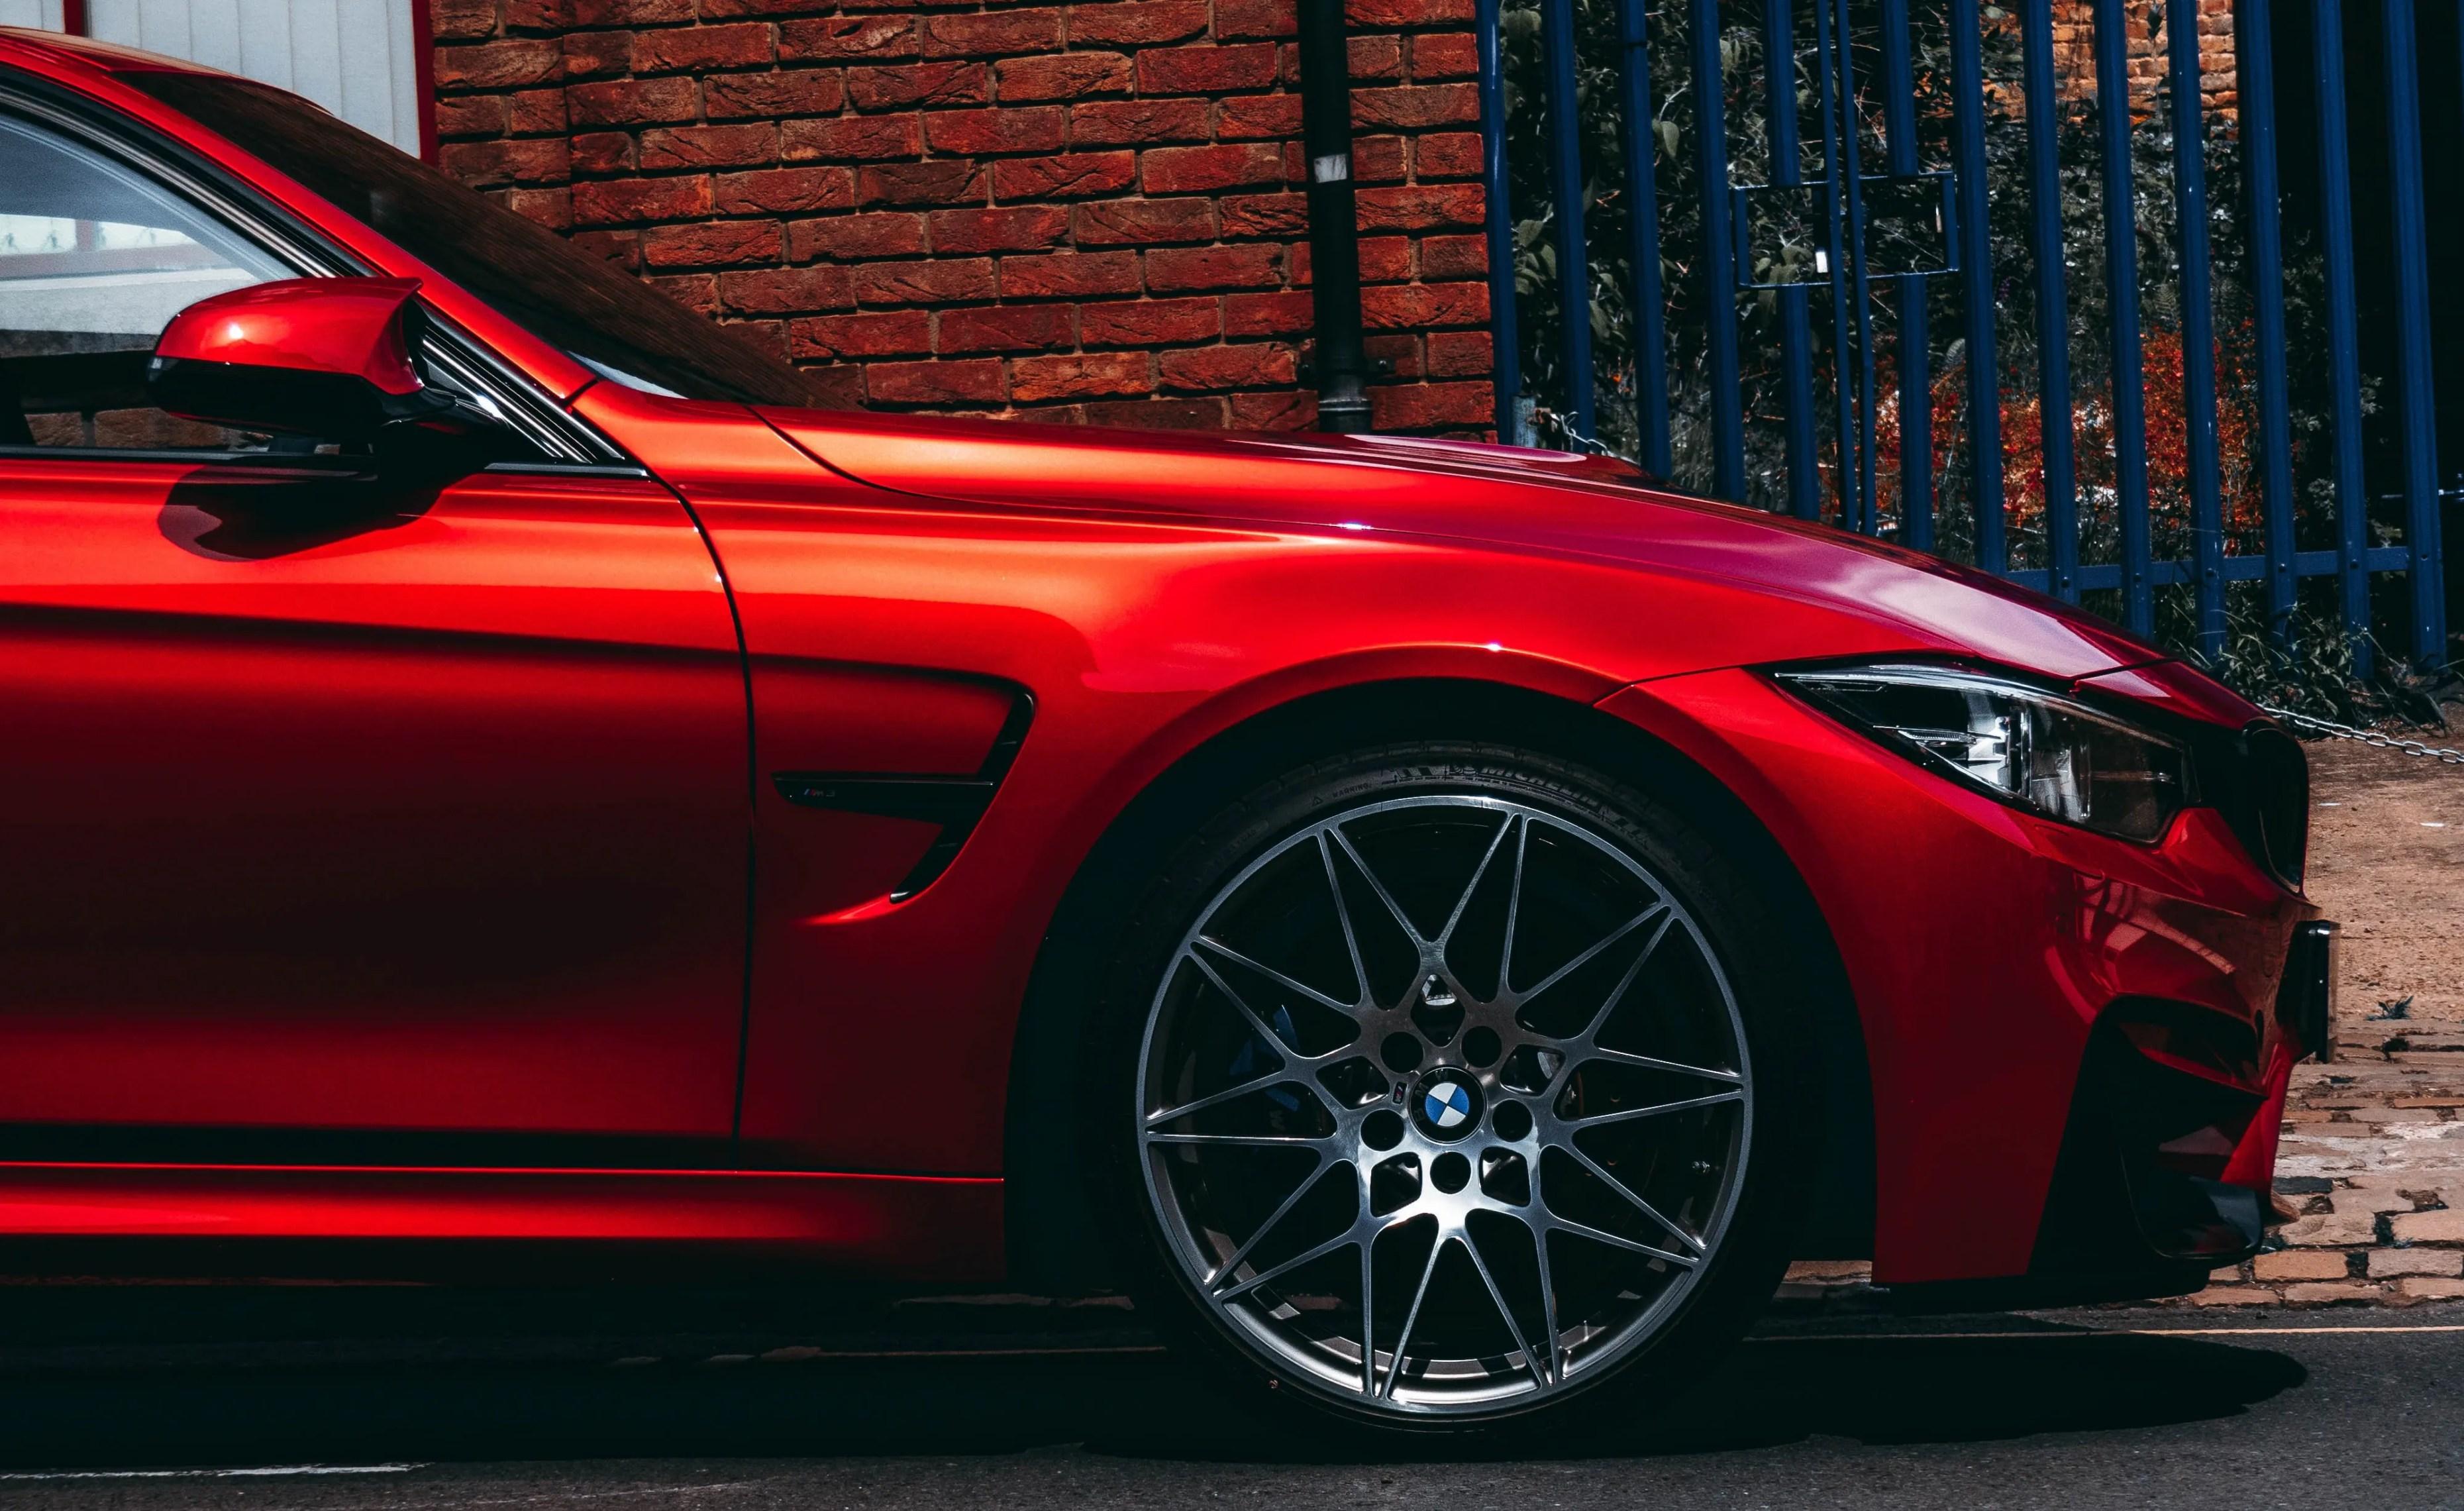 SmartOne Auto Dealerships Marketing Red BMW